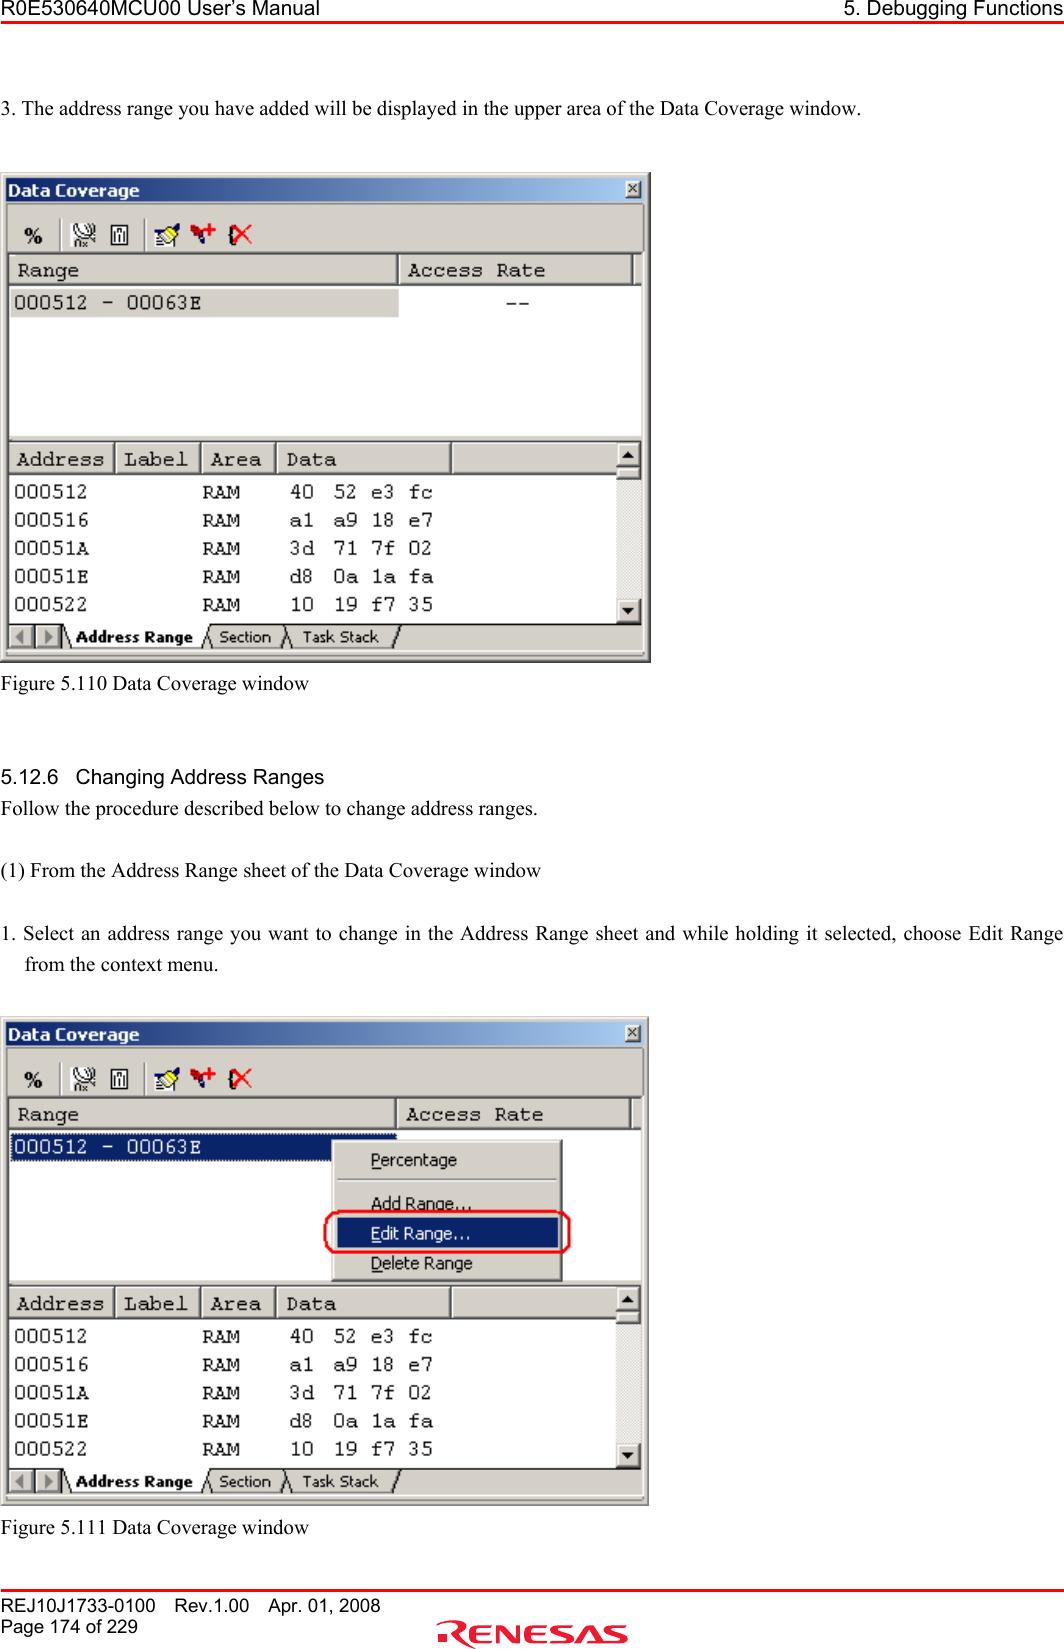 Renesas M16C 64 Users Manual R0E530640MCU00 User's (E100